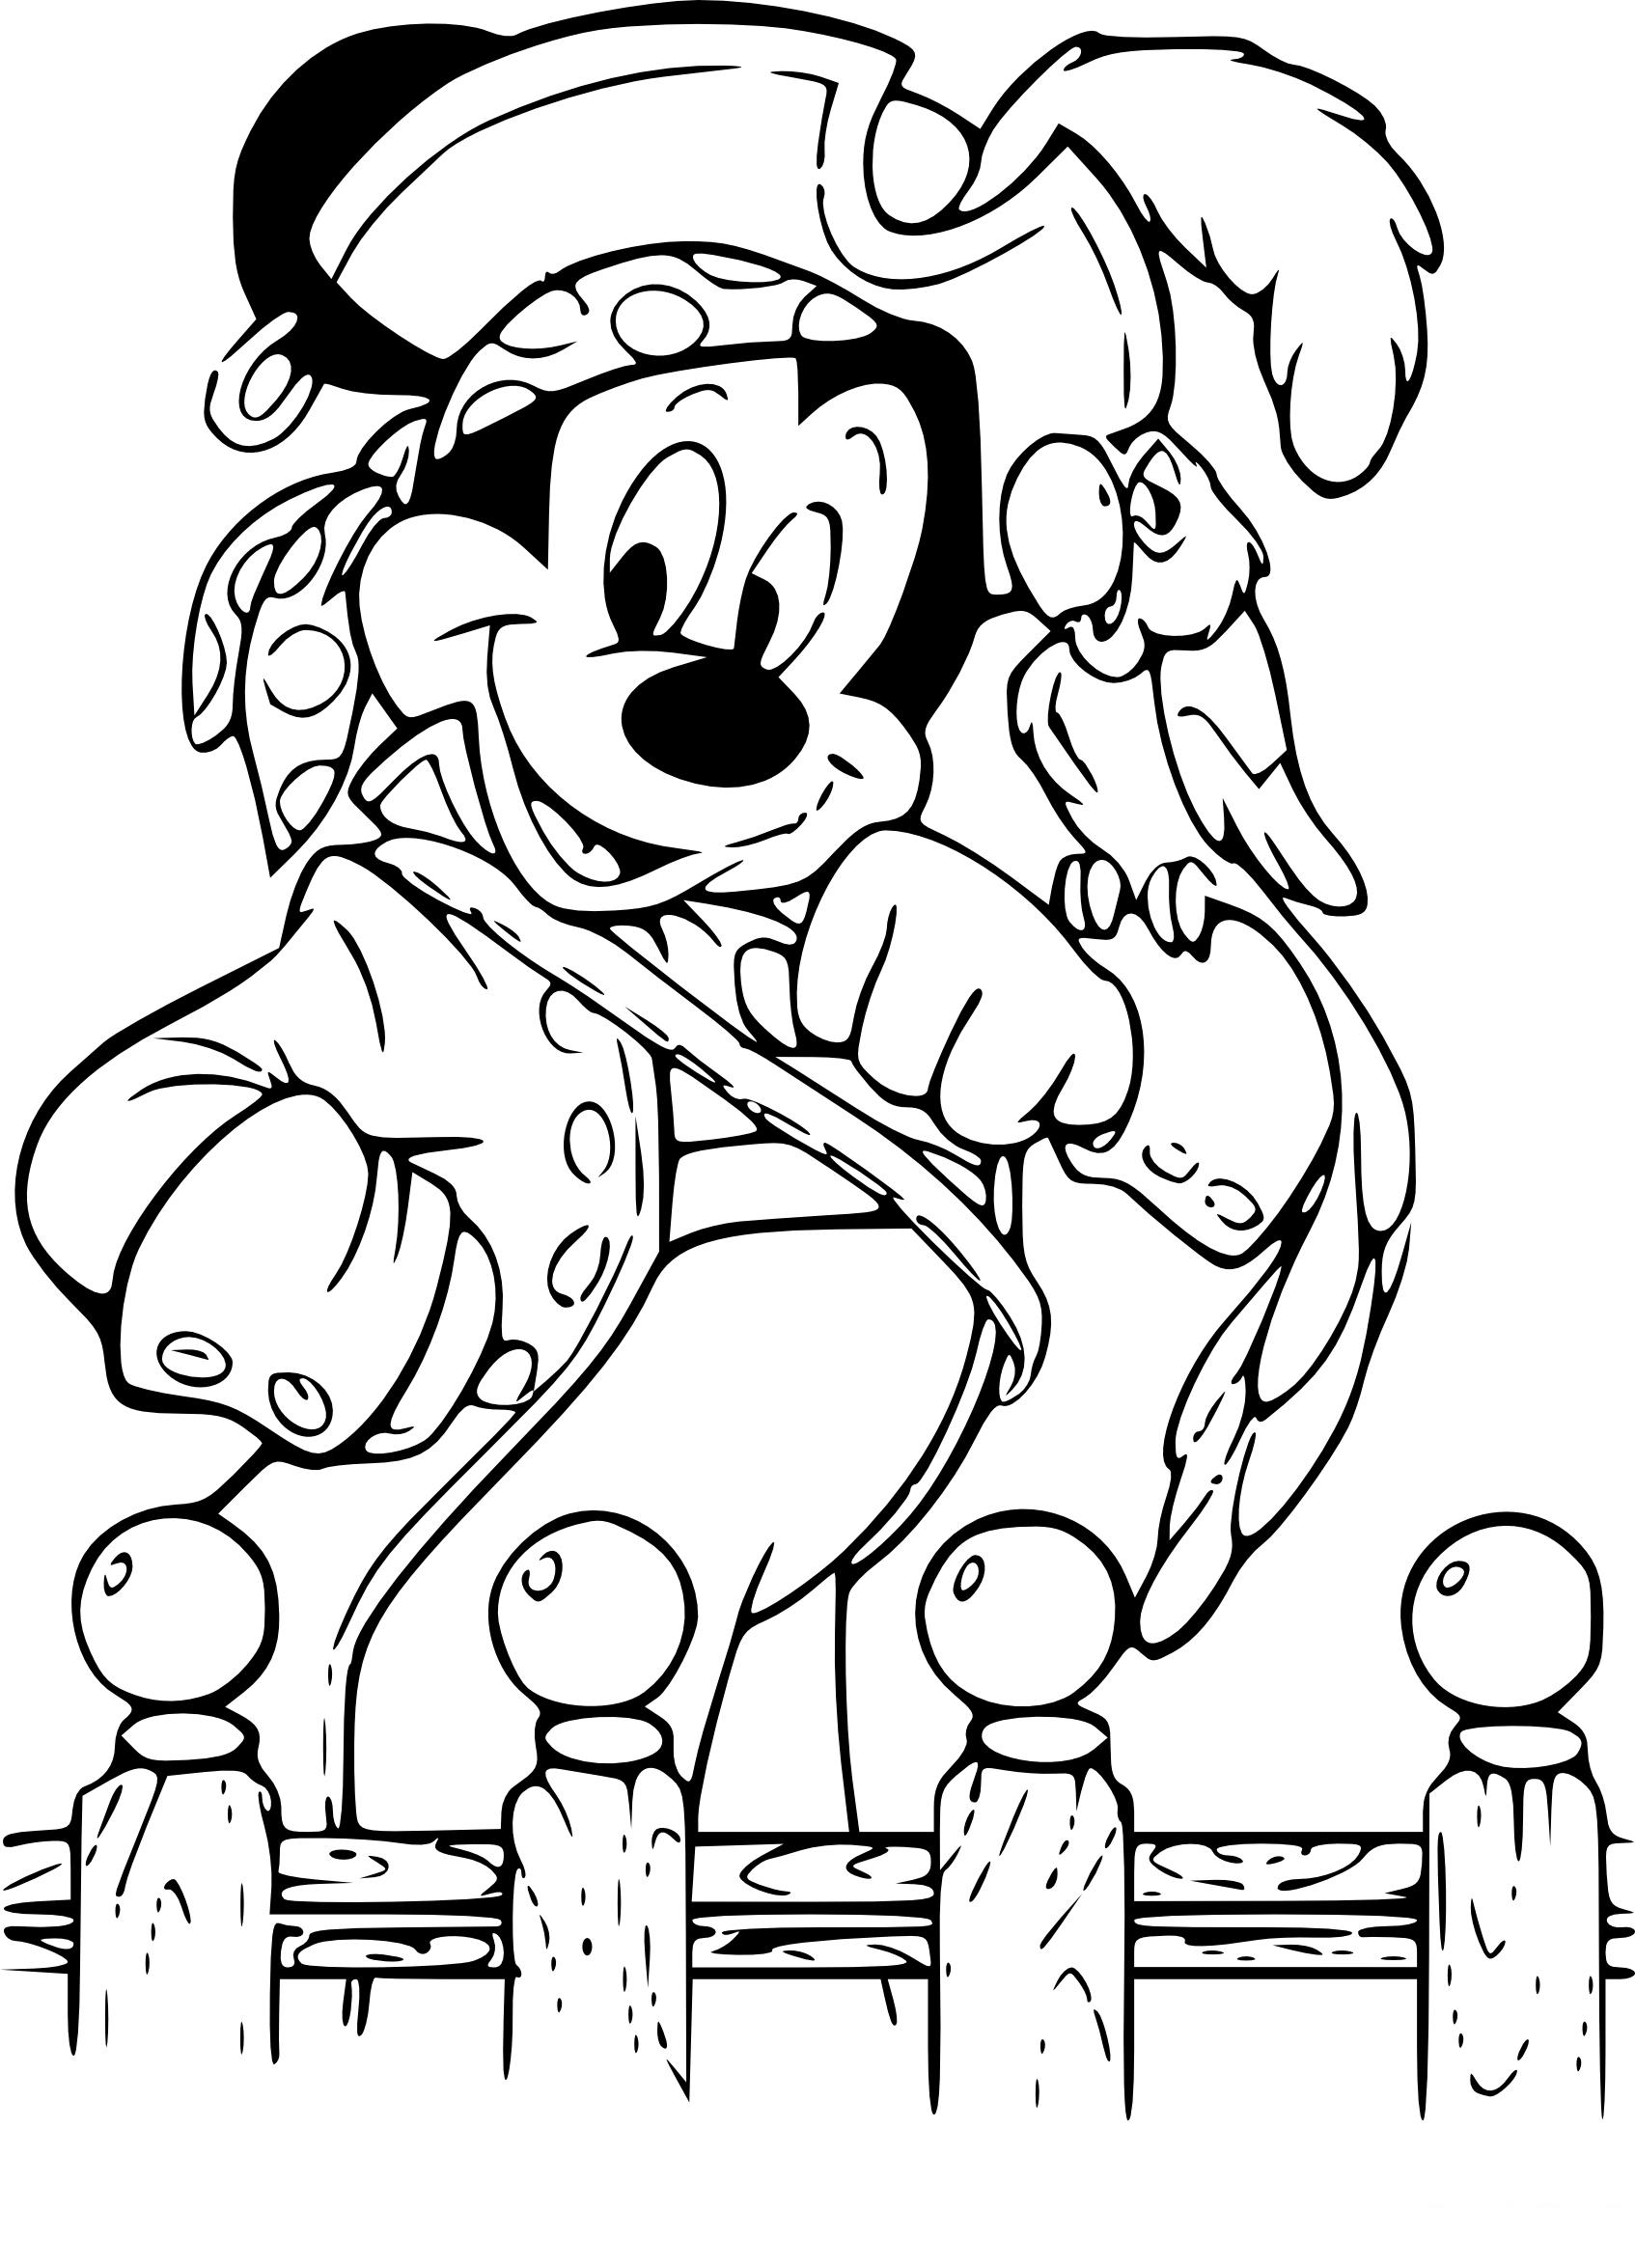 Coloriage Mickey Pirate À Imprimer avec Coloriage Mickey